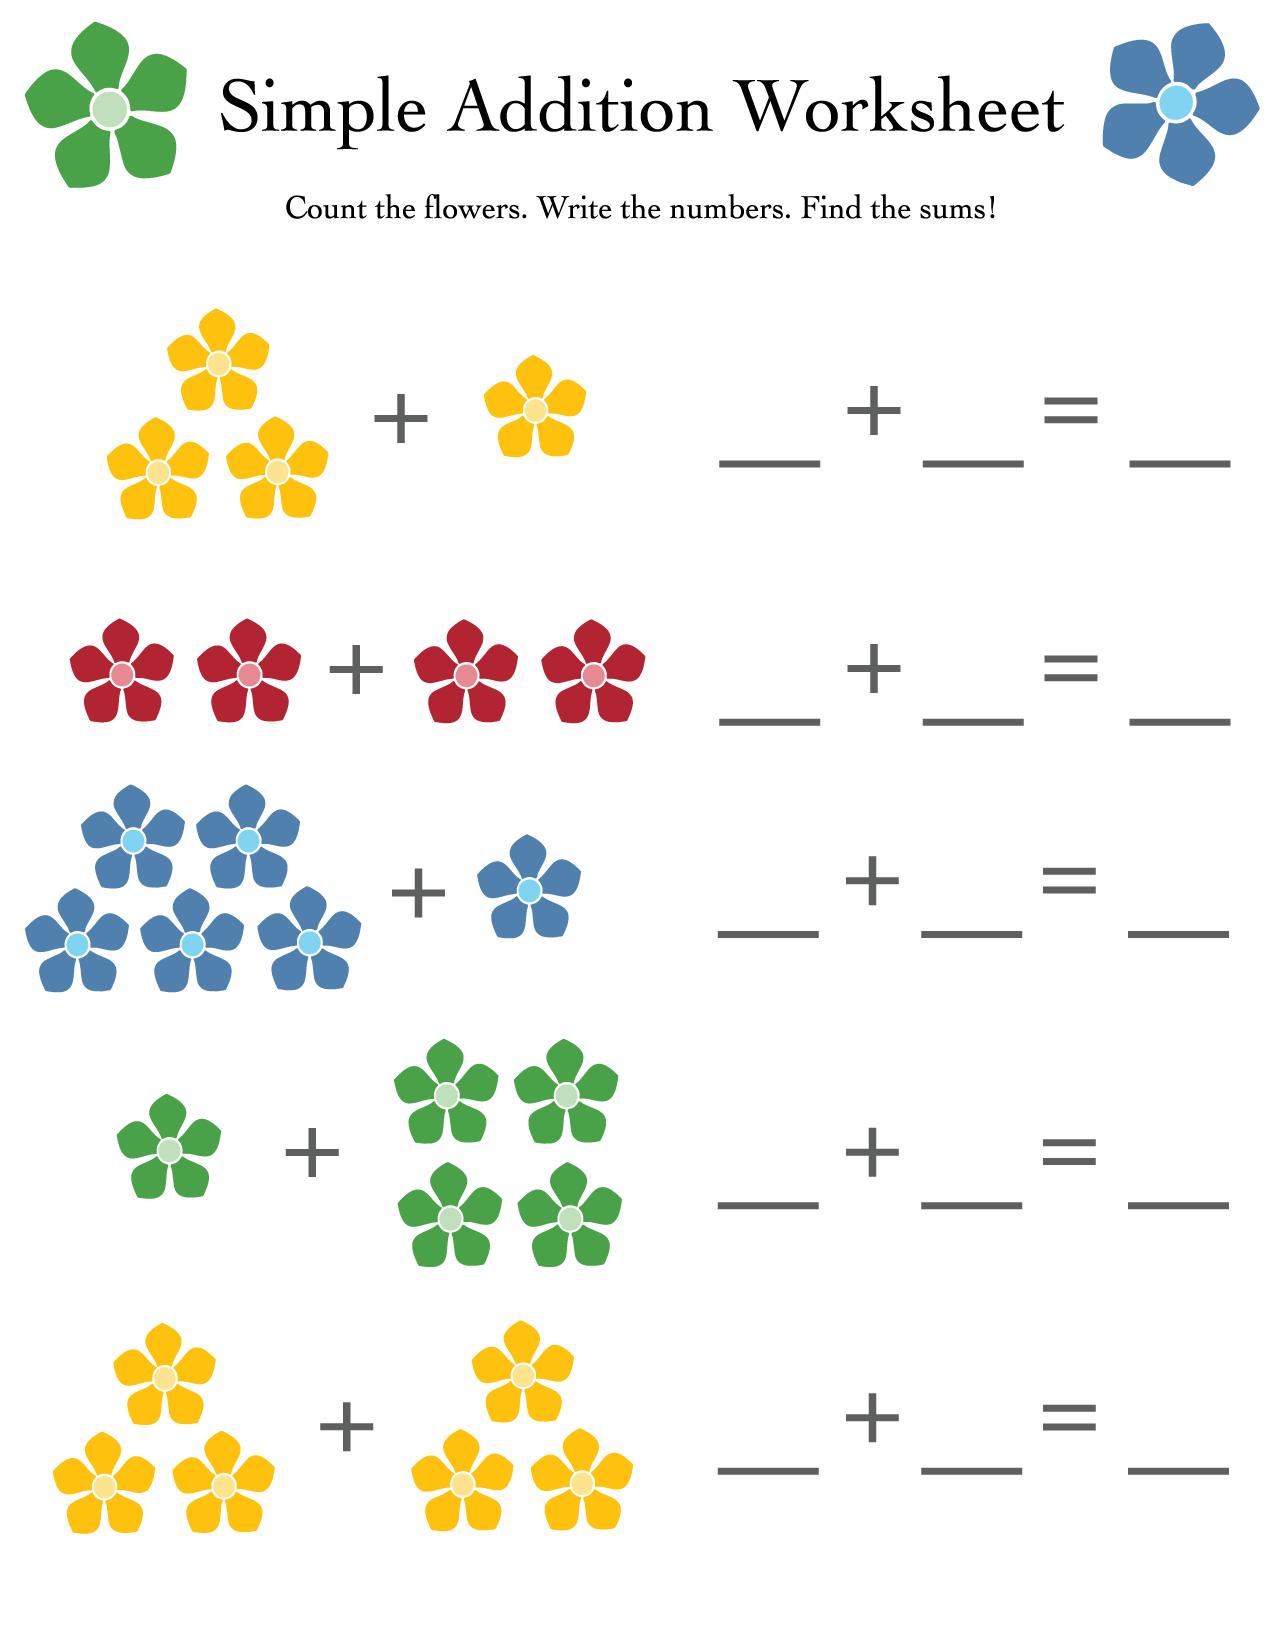 Simple addition worksheet